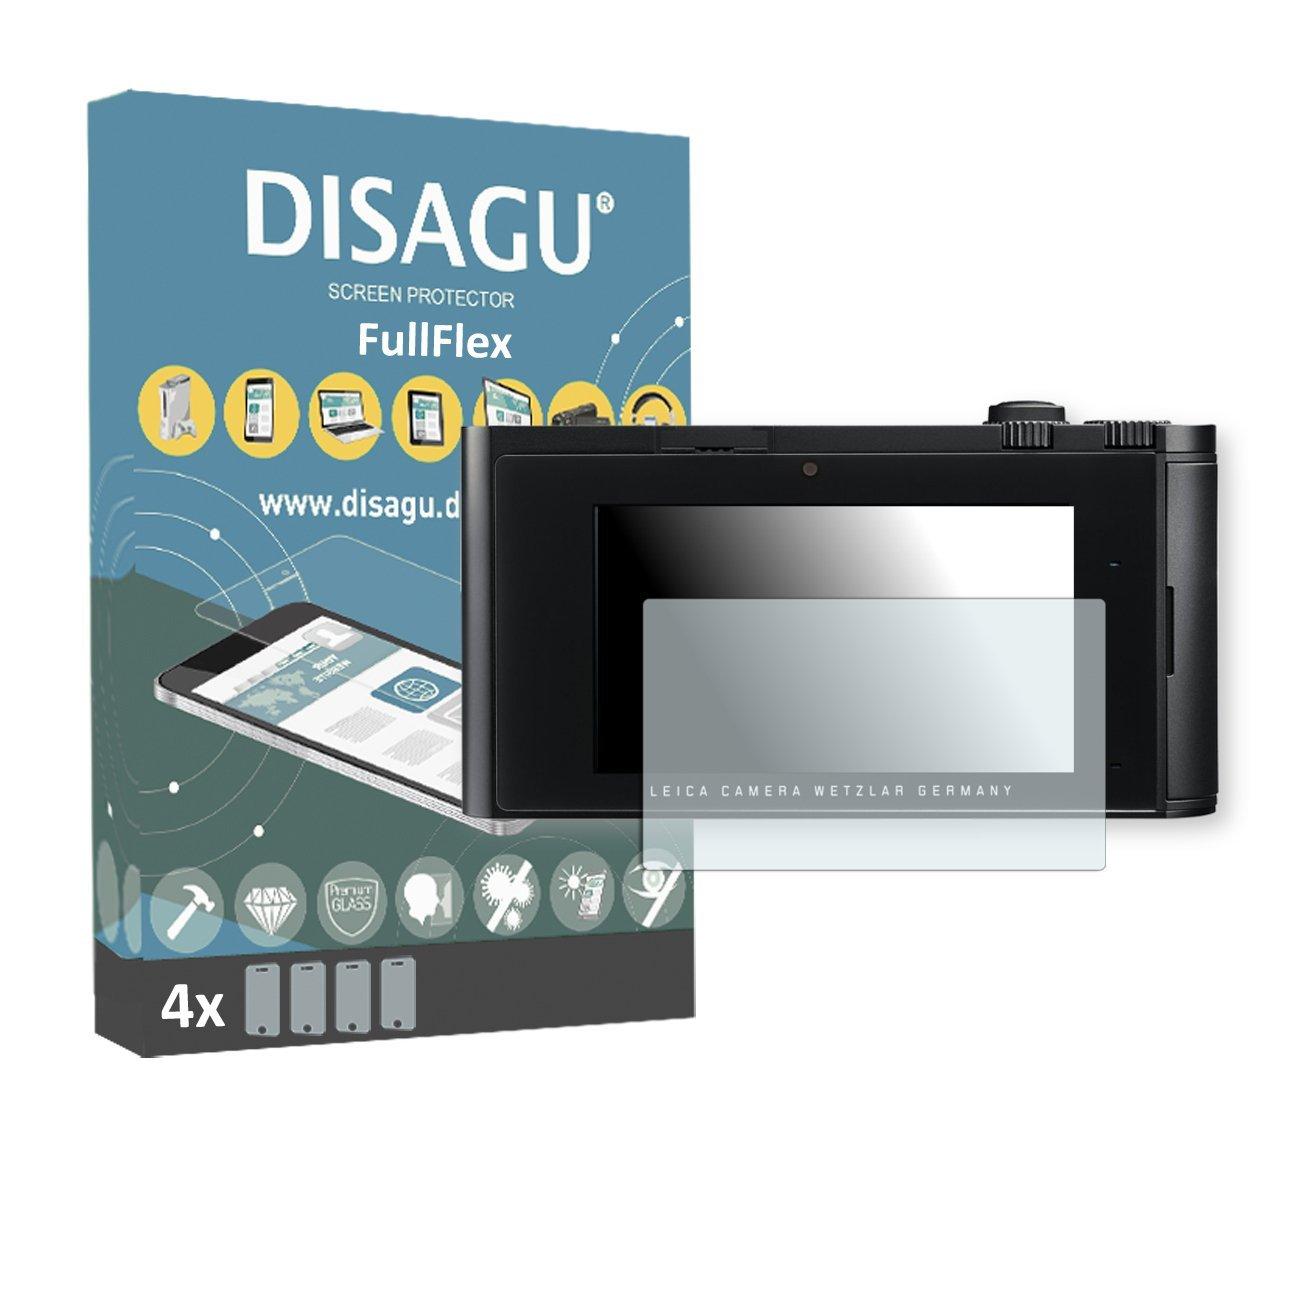 4 x Disagu FullFlex screen protector for Leica T foil screen protector